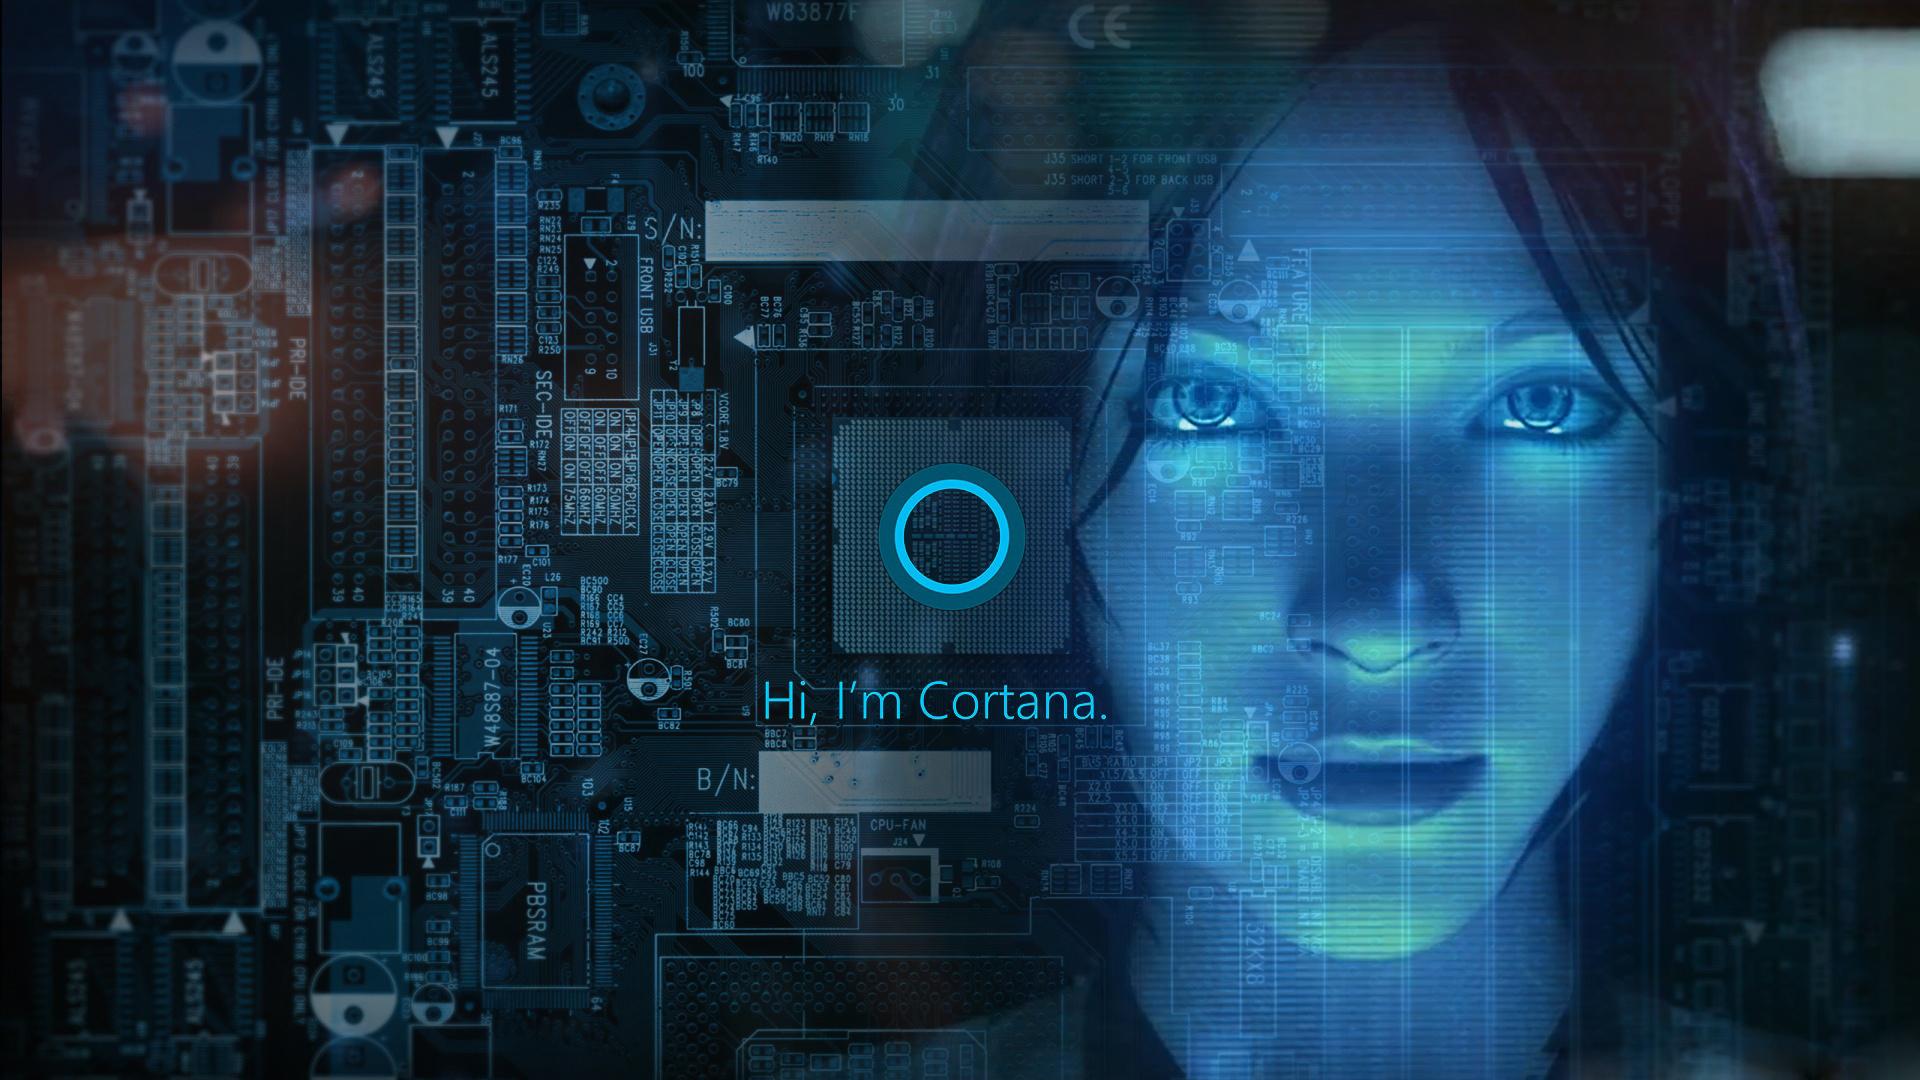 Windows Phone Voice Hi Im Cortana wallpaper Best HD Wallpapers 1920x1080